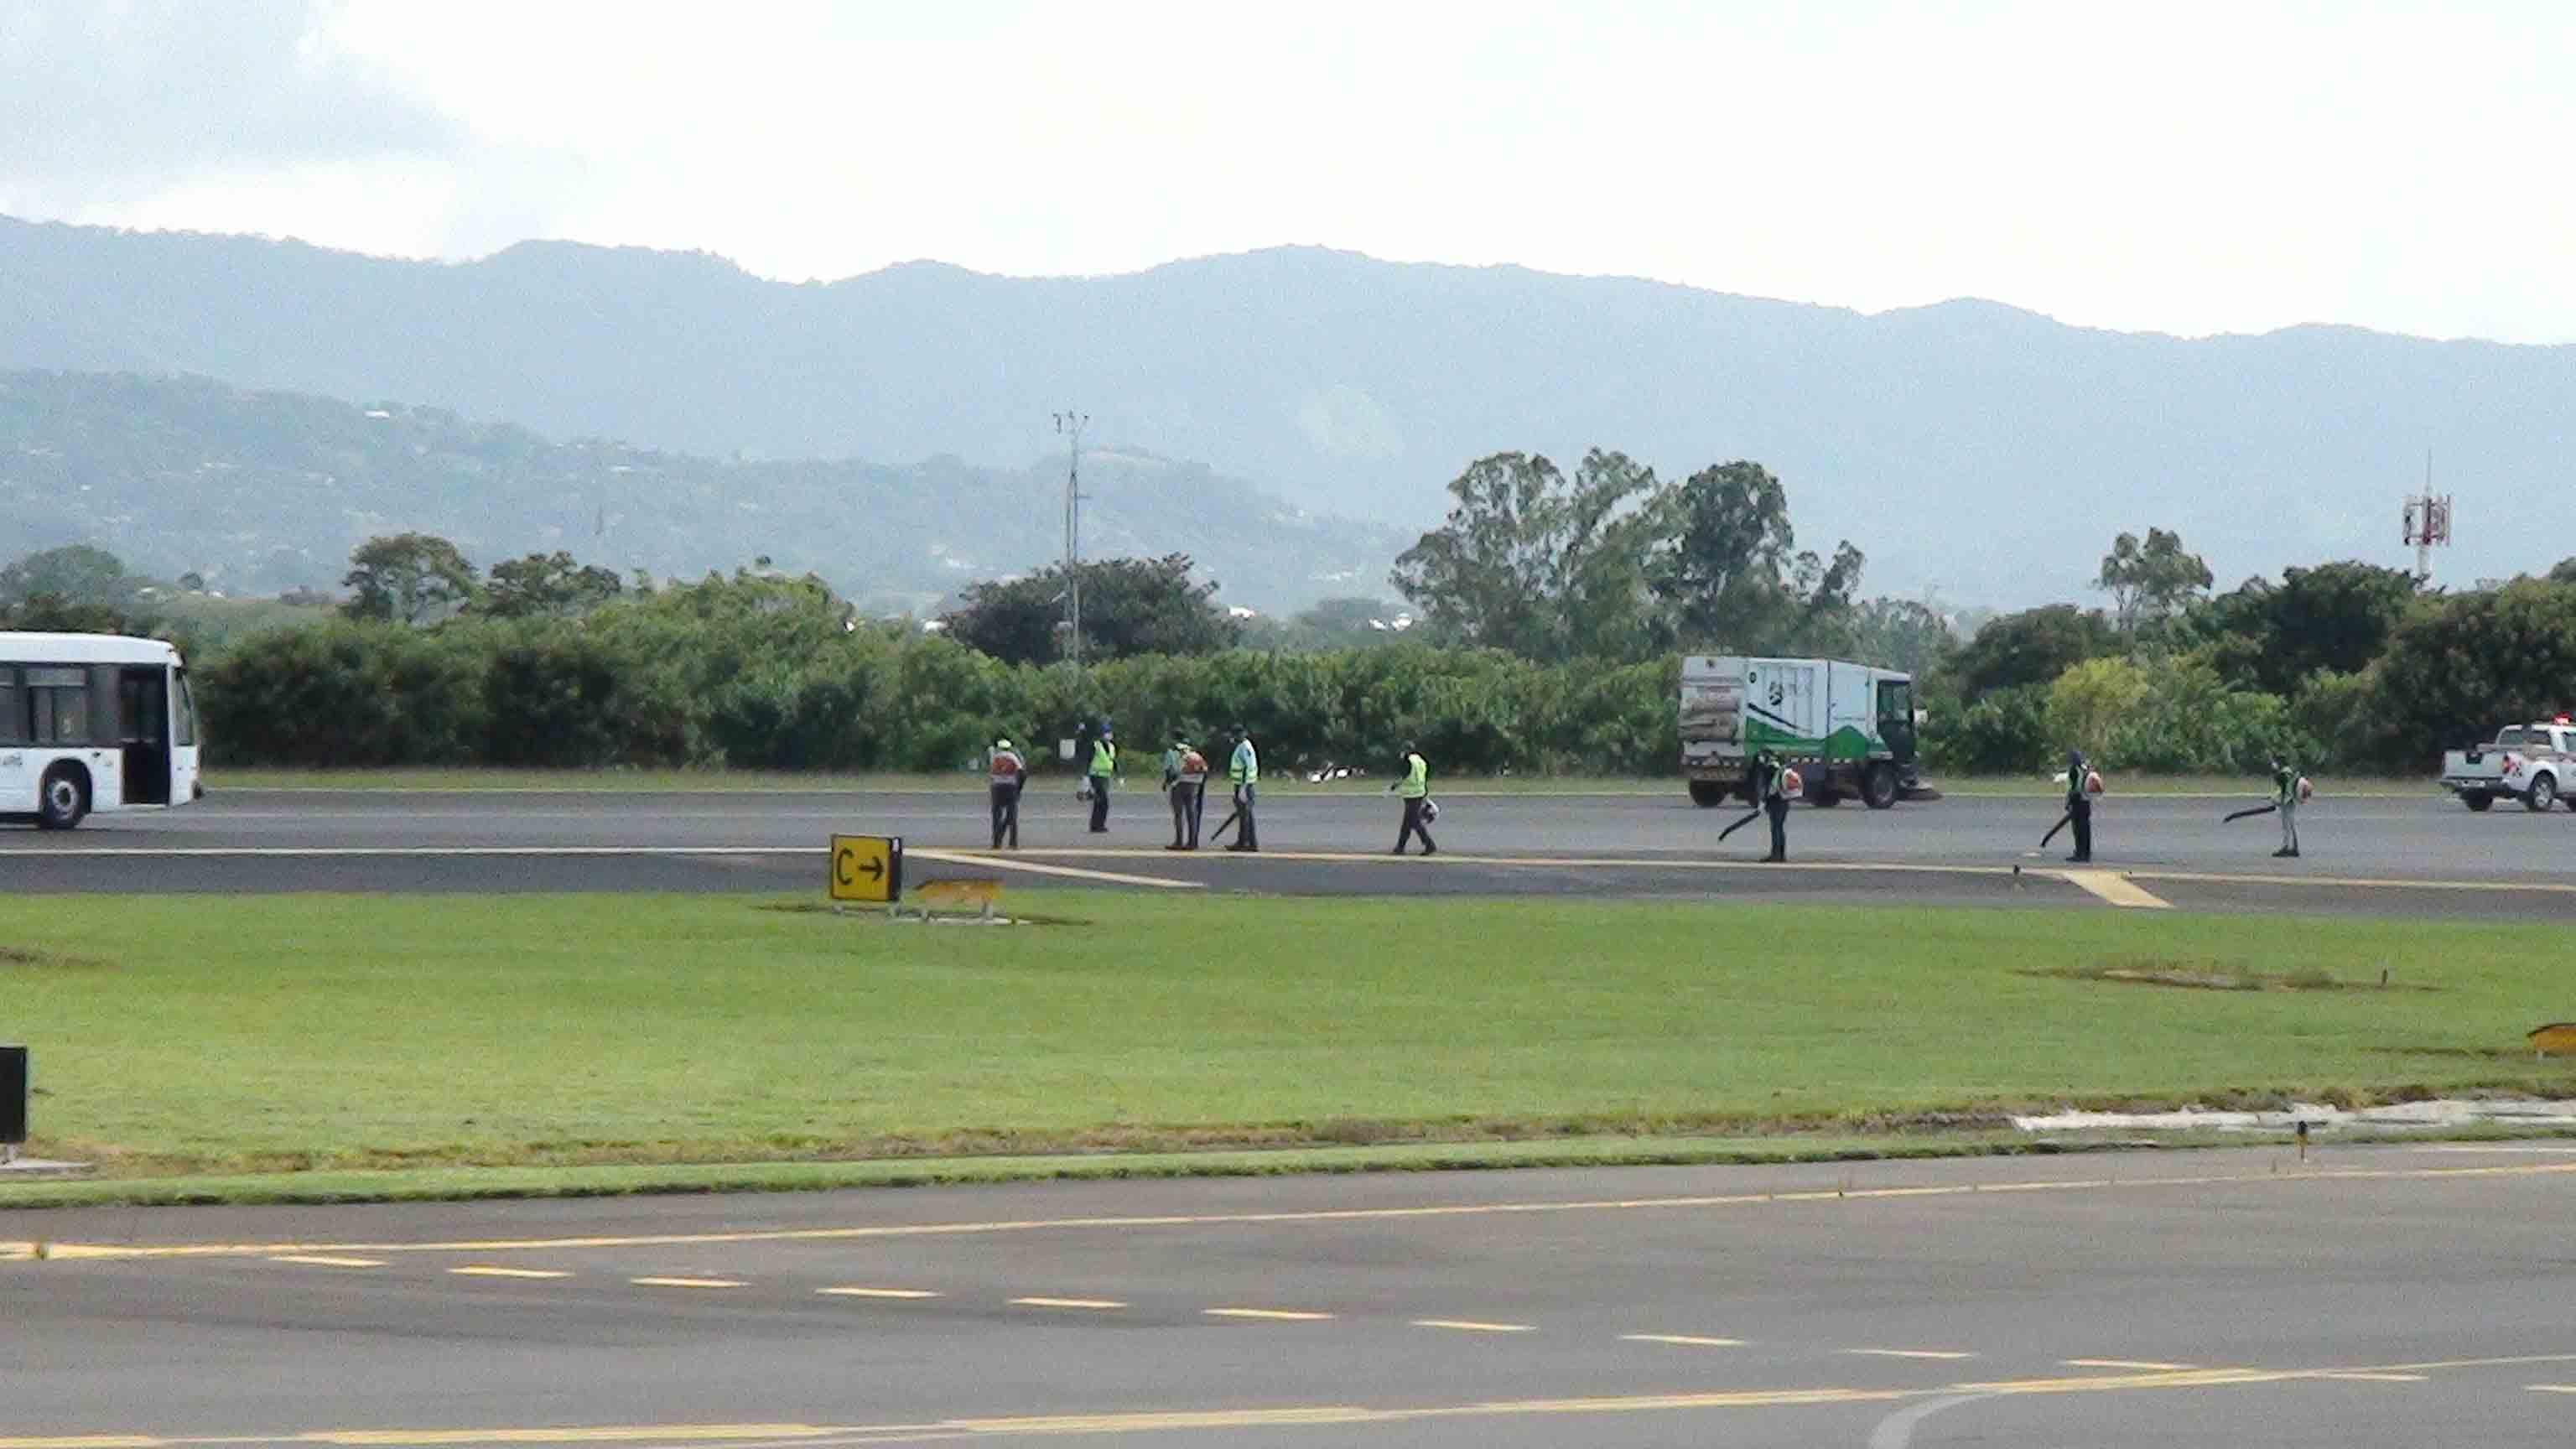 operaciones-limpieza-aterrizaje-aeropuerto-protocolo_lncima20160919_0104_1